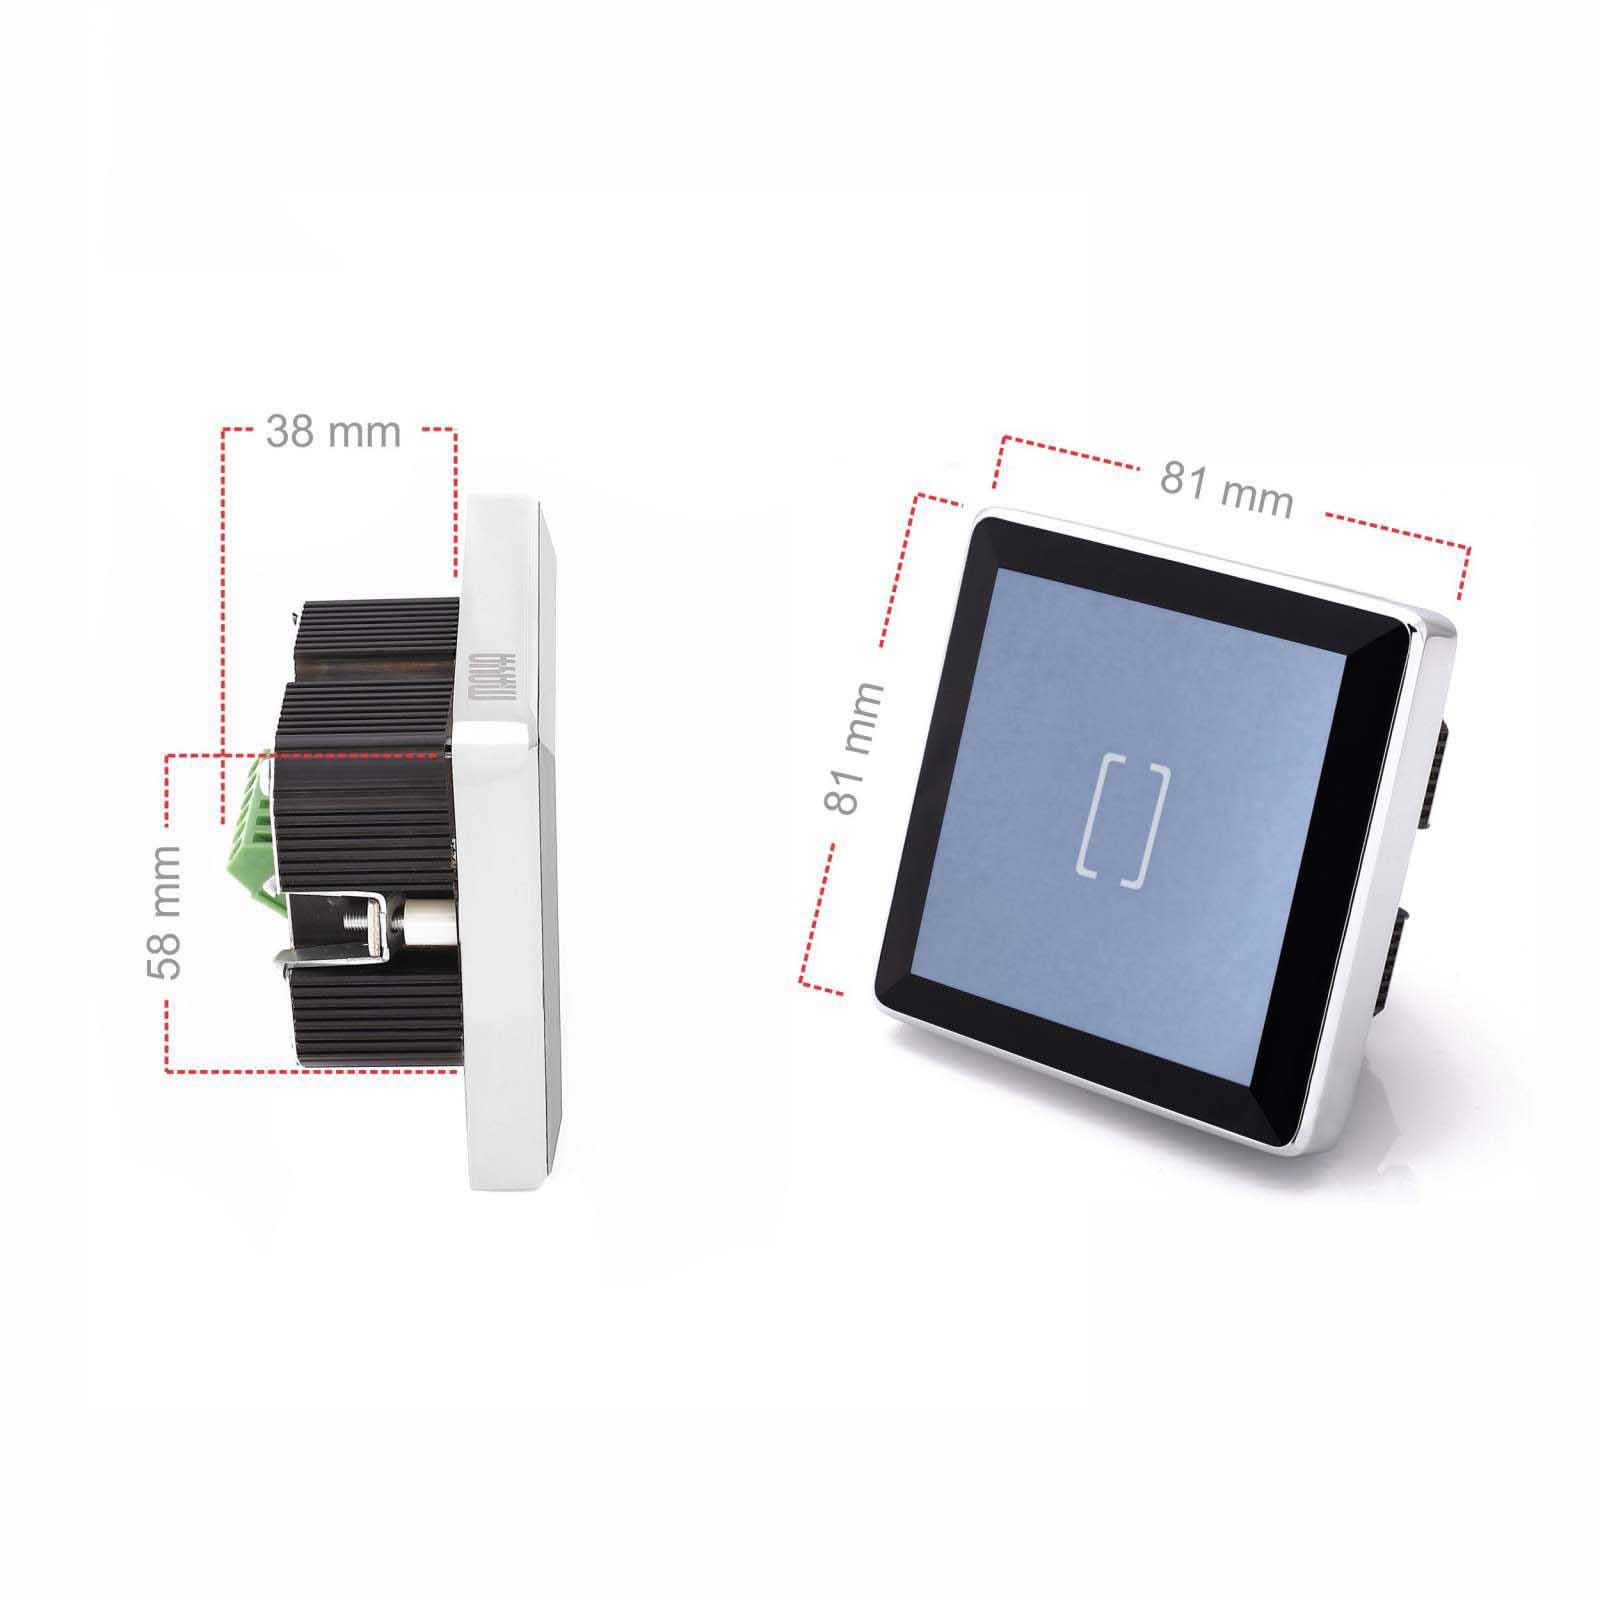 کلید لمسی تک پل هوشمند مایا مدل MR1ES11